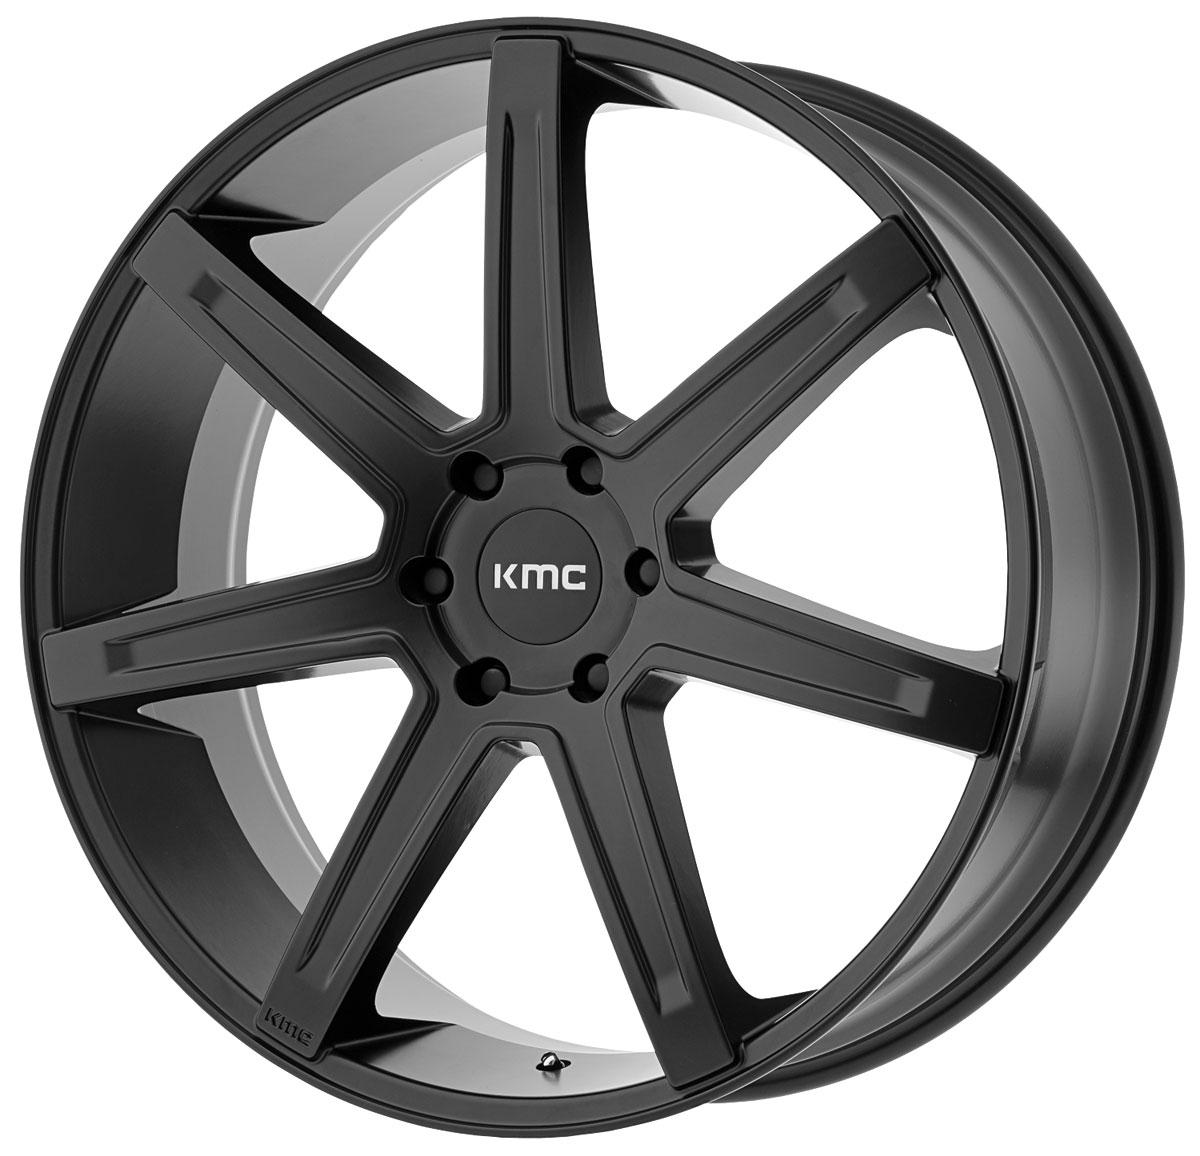 Wheel, KMC, KM700 Revert, 1999-2019 Escalade, 24X9.5